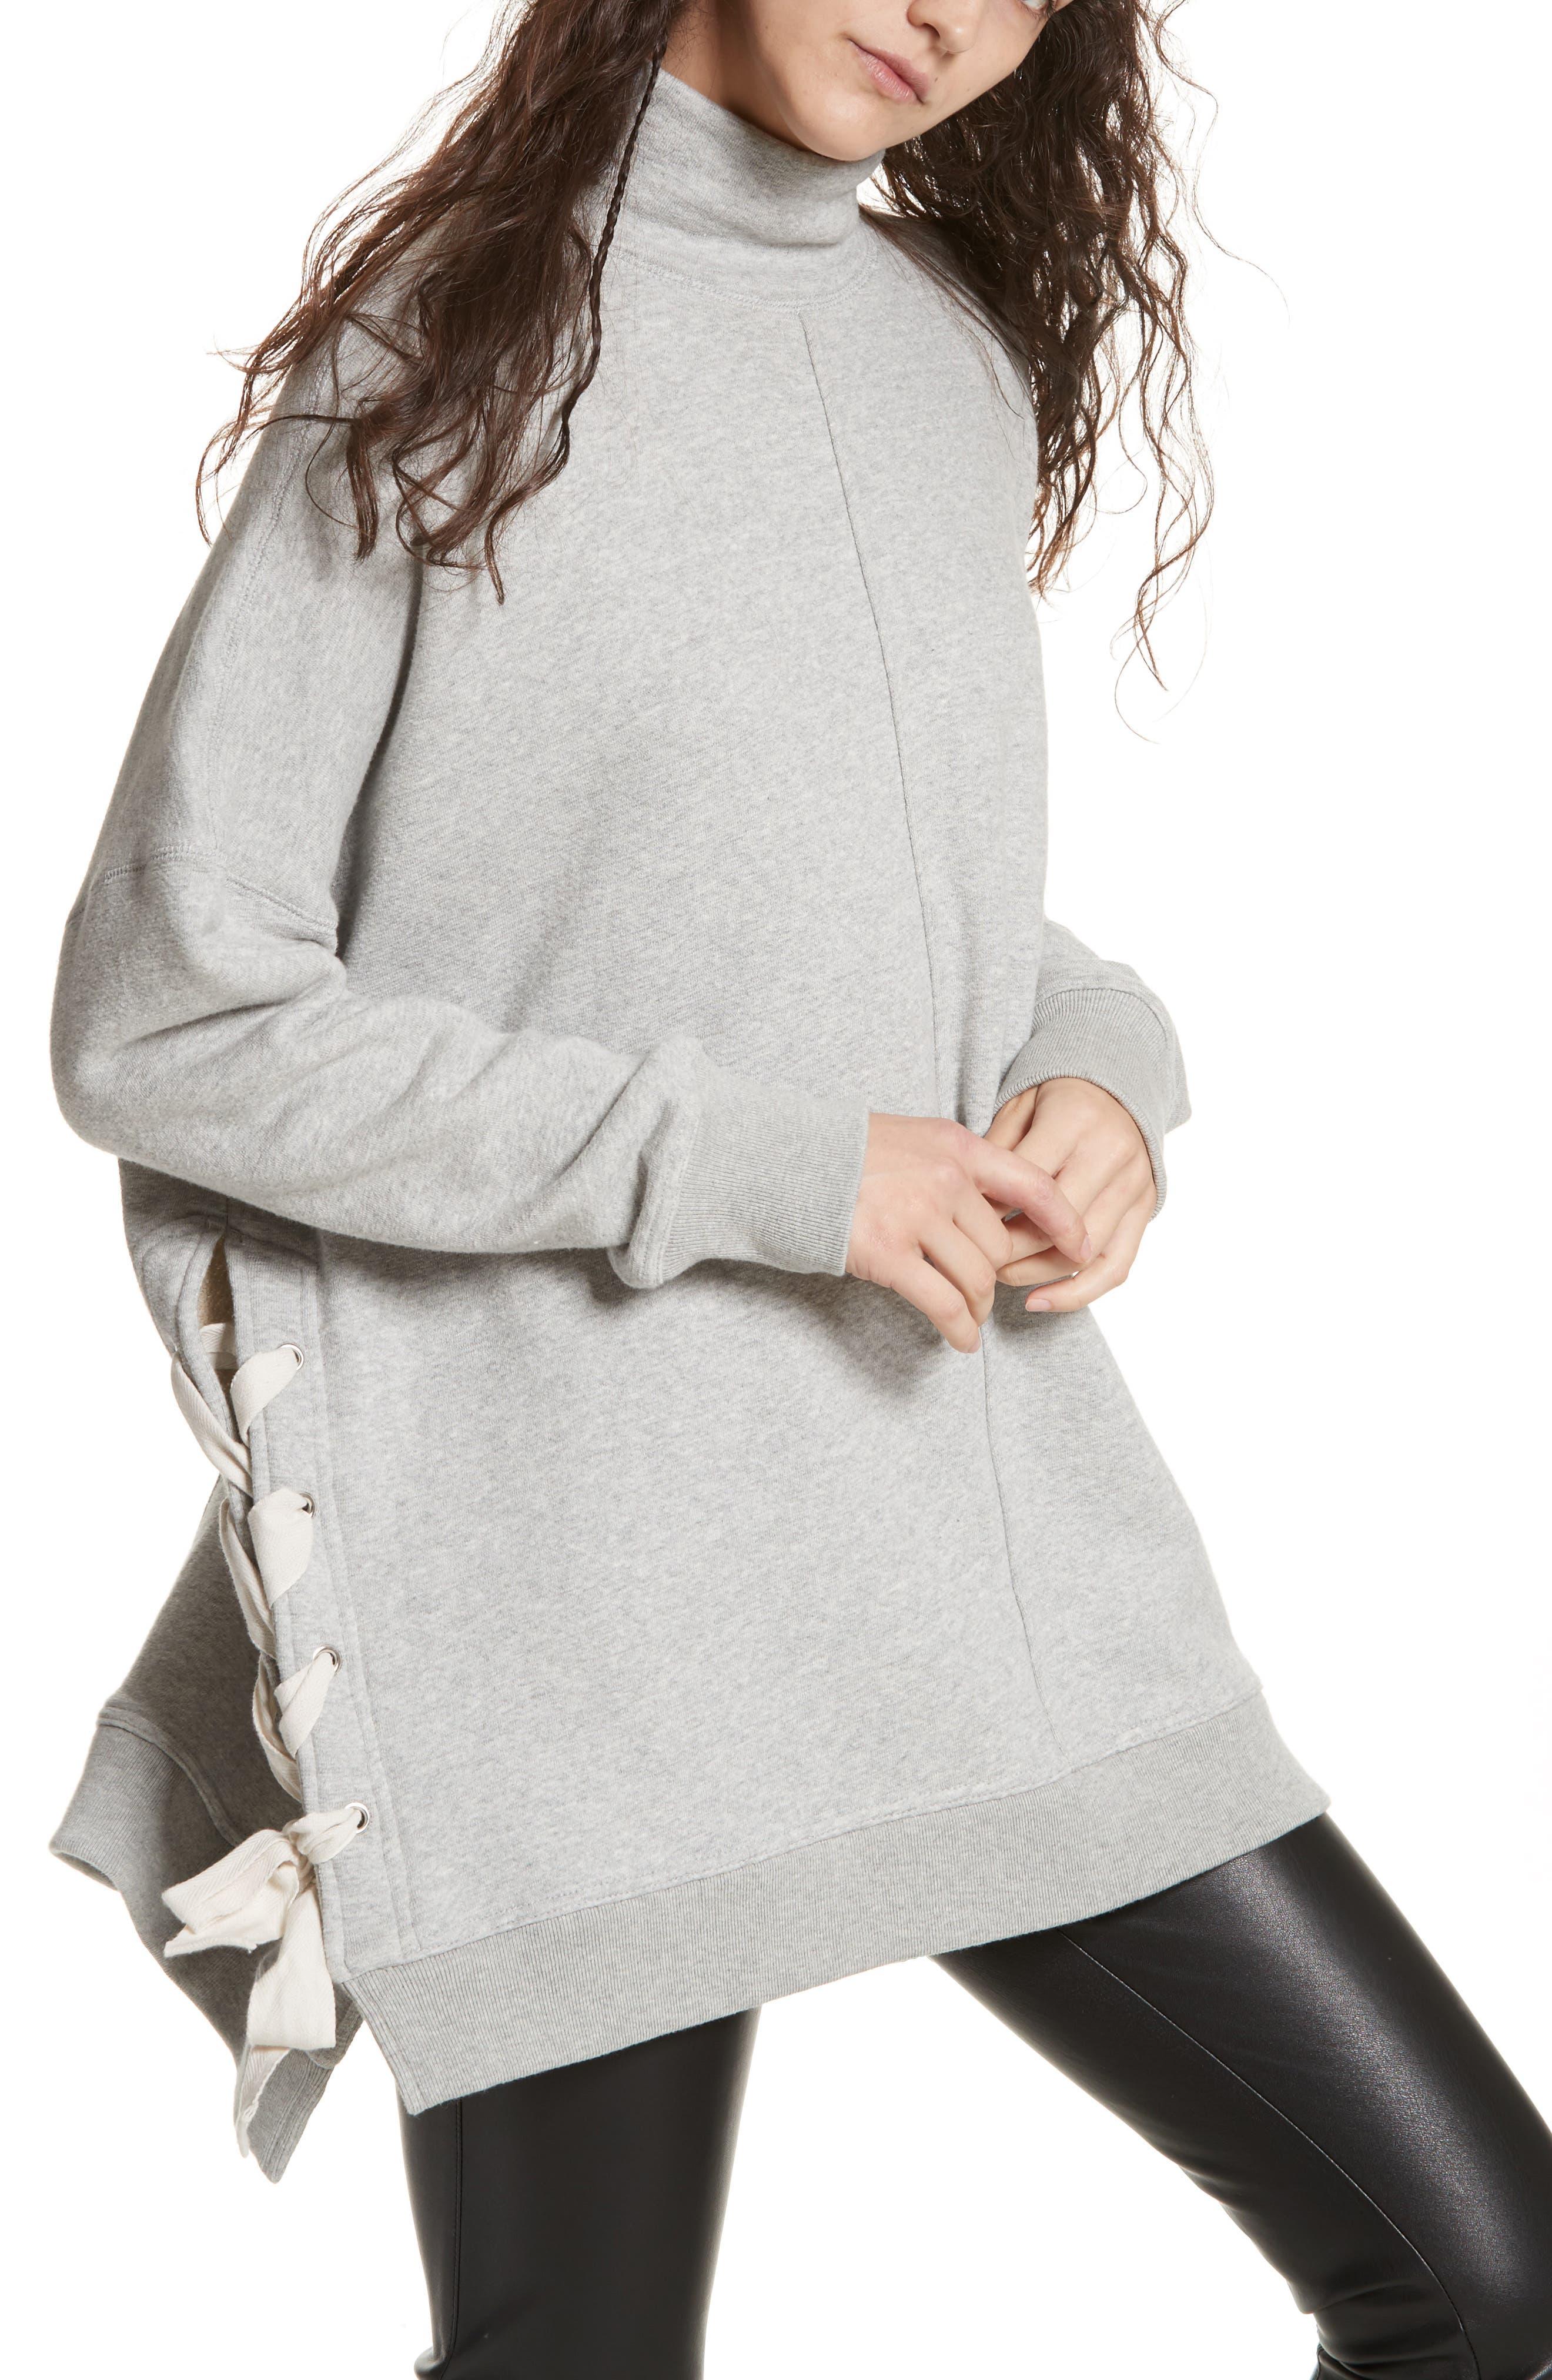 So Plush Lace-Up Pullover,                             Main thumbnail 1, color,                             Grey